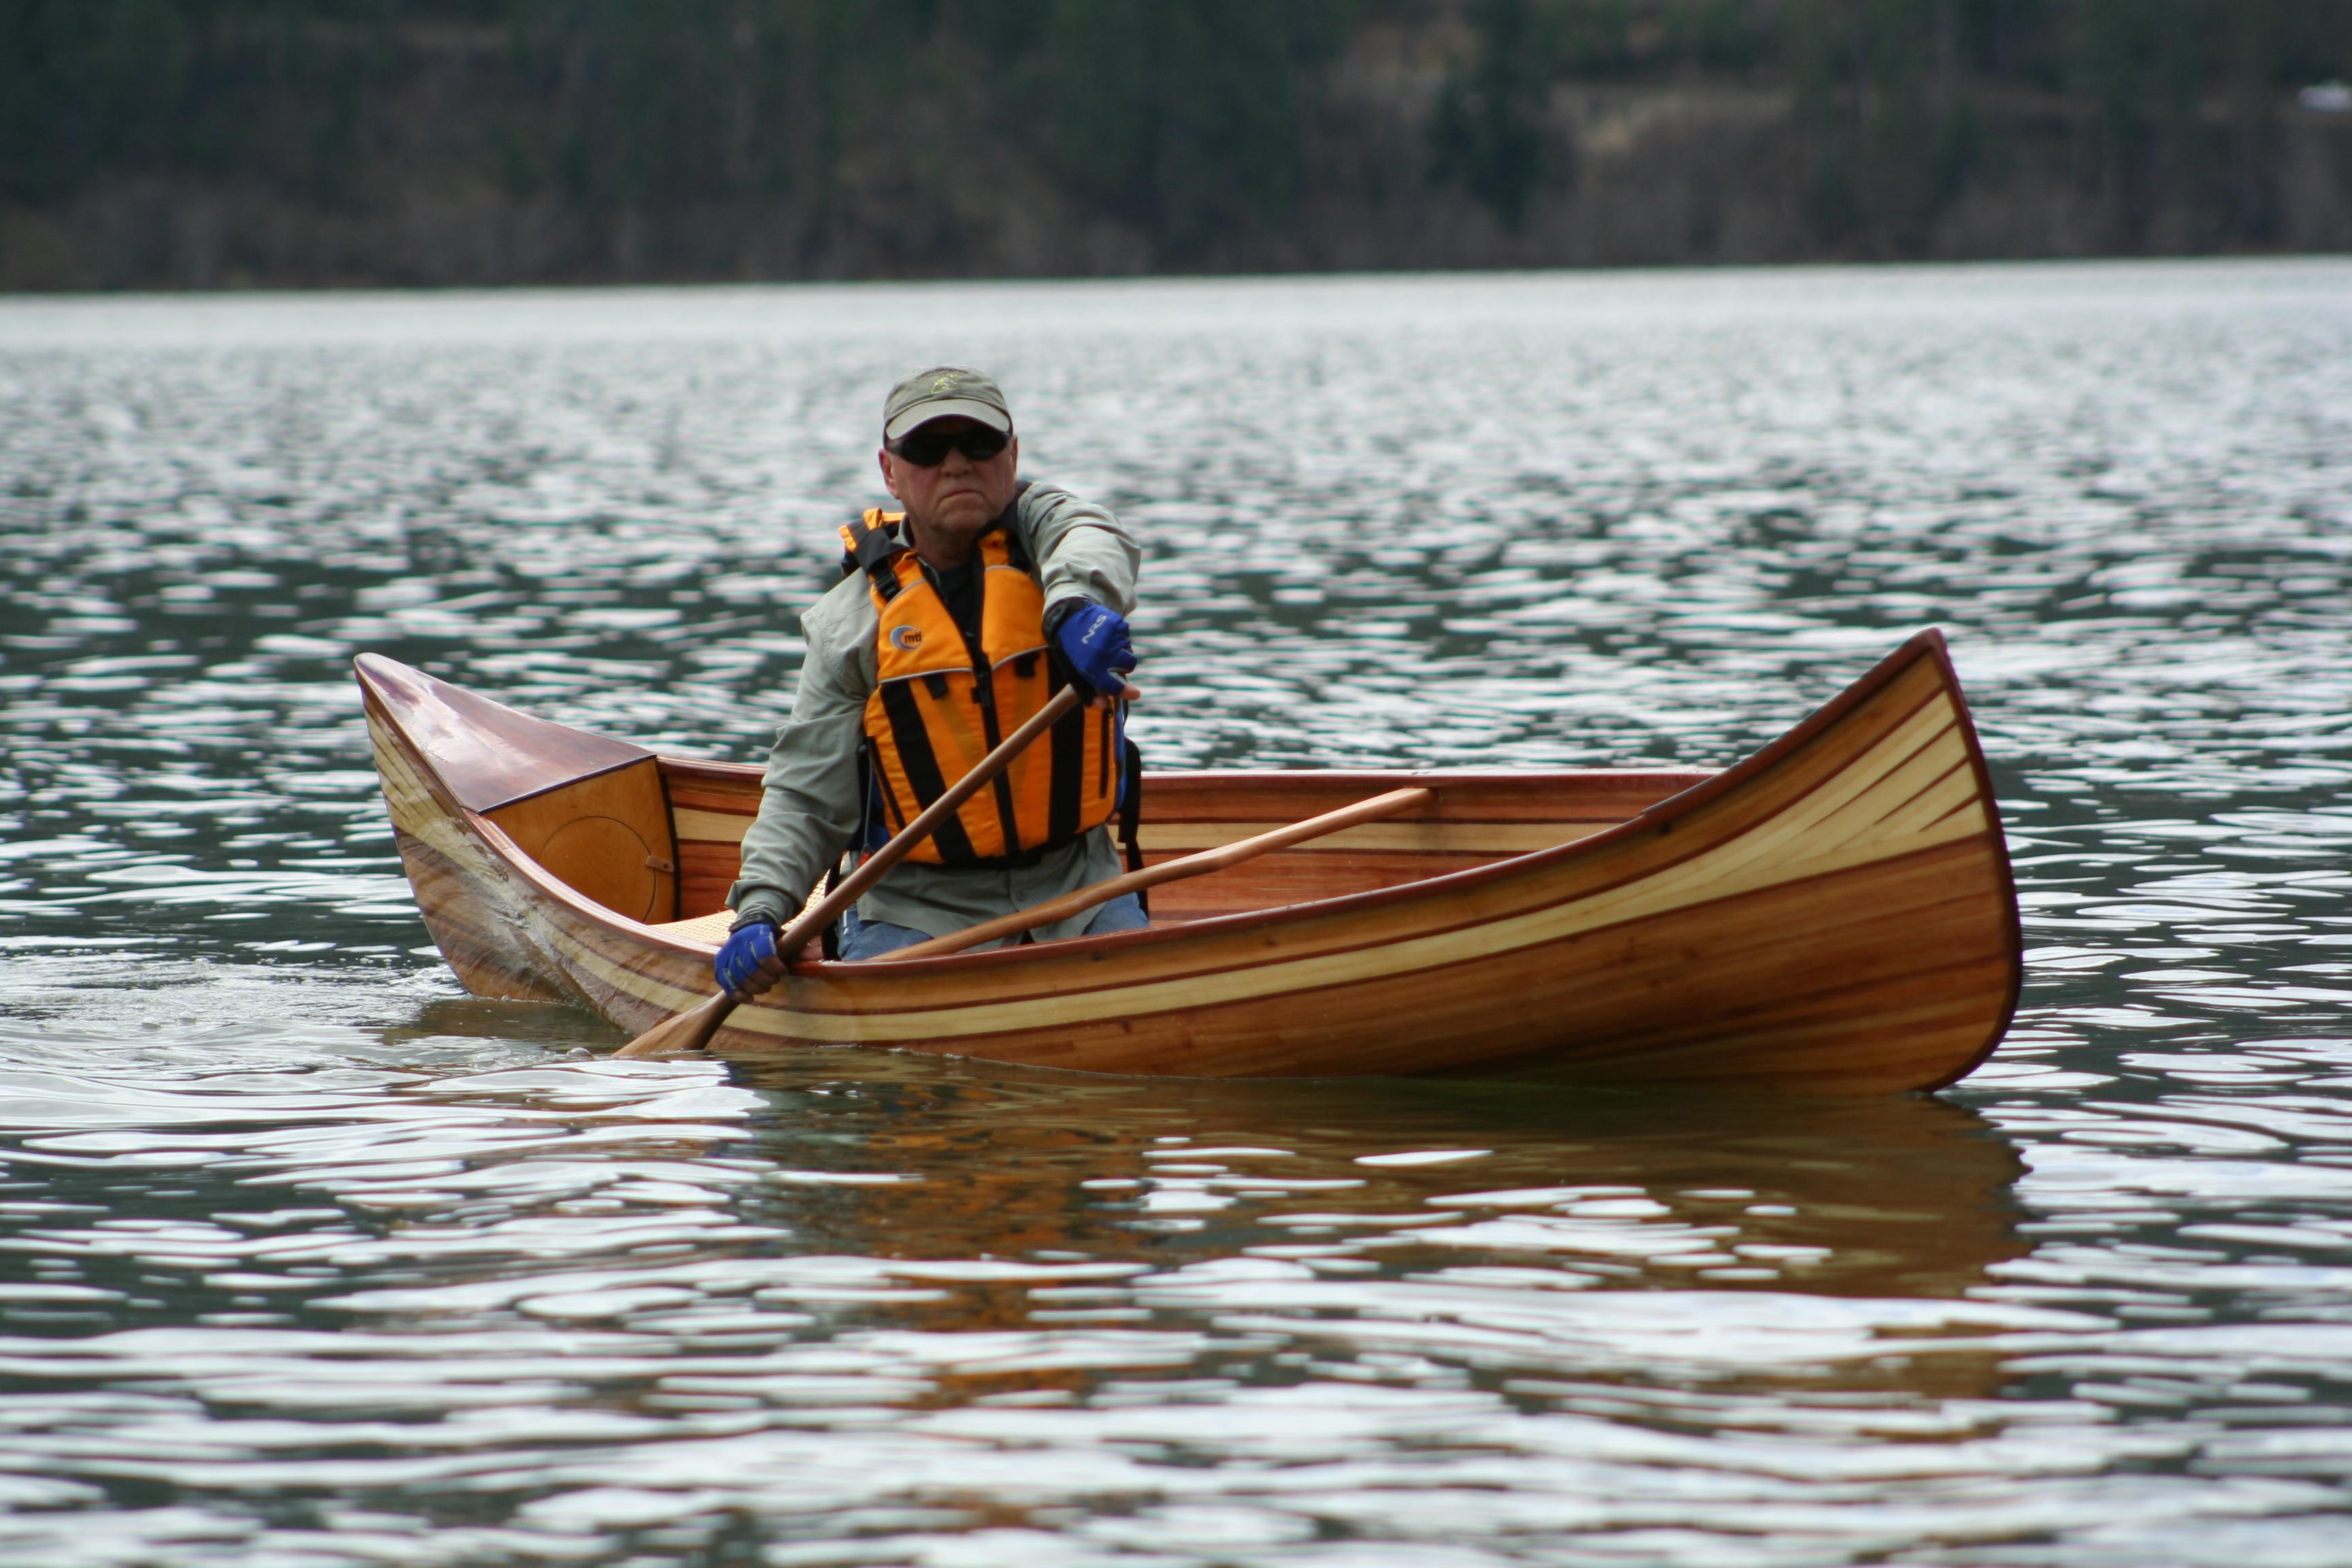 Canoe HD wallpapers, Desktop wallpaper - most viewed